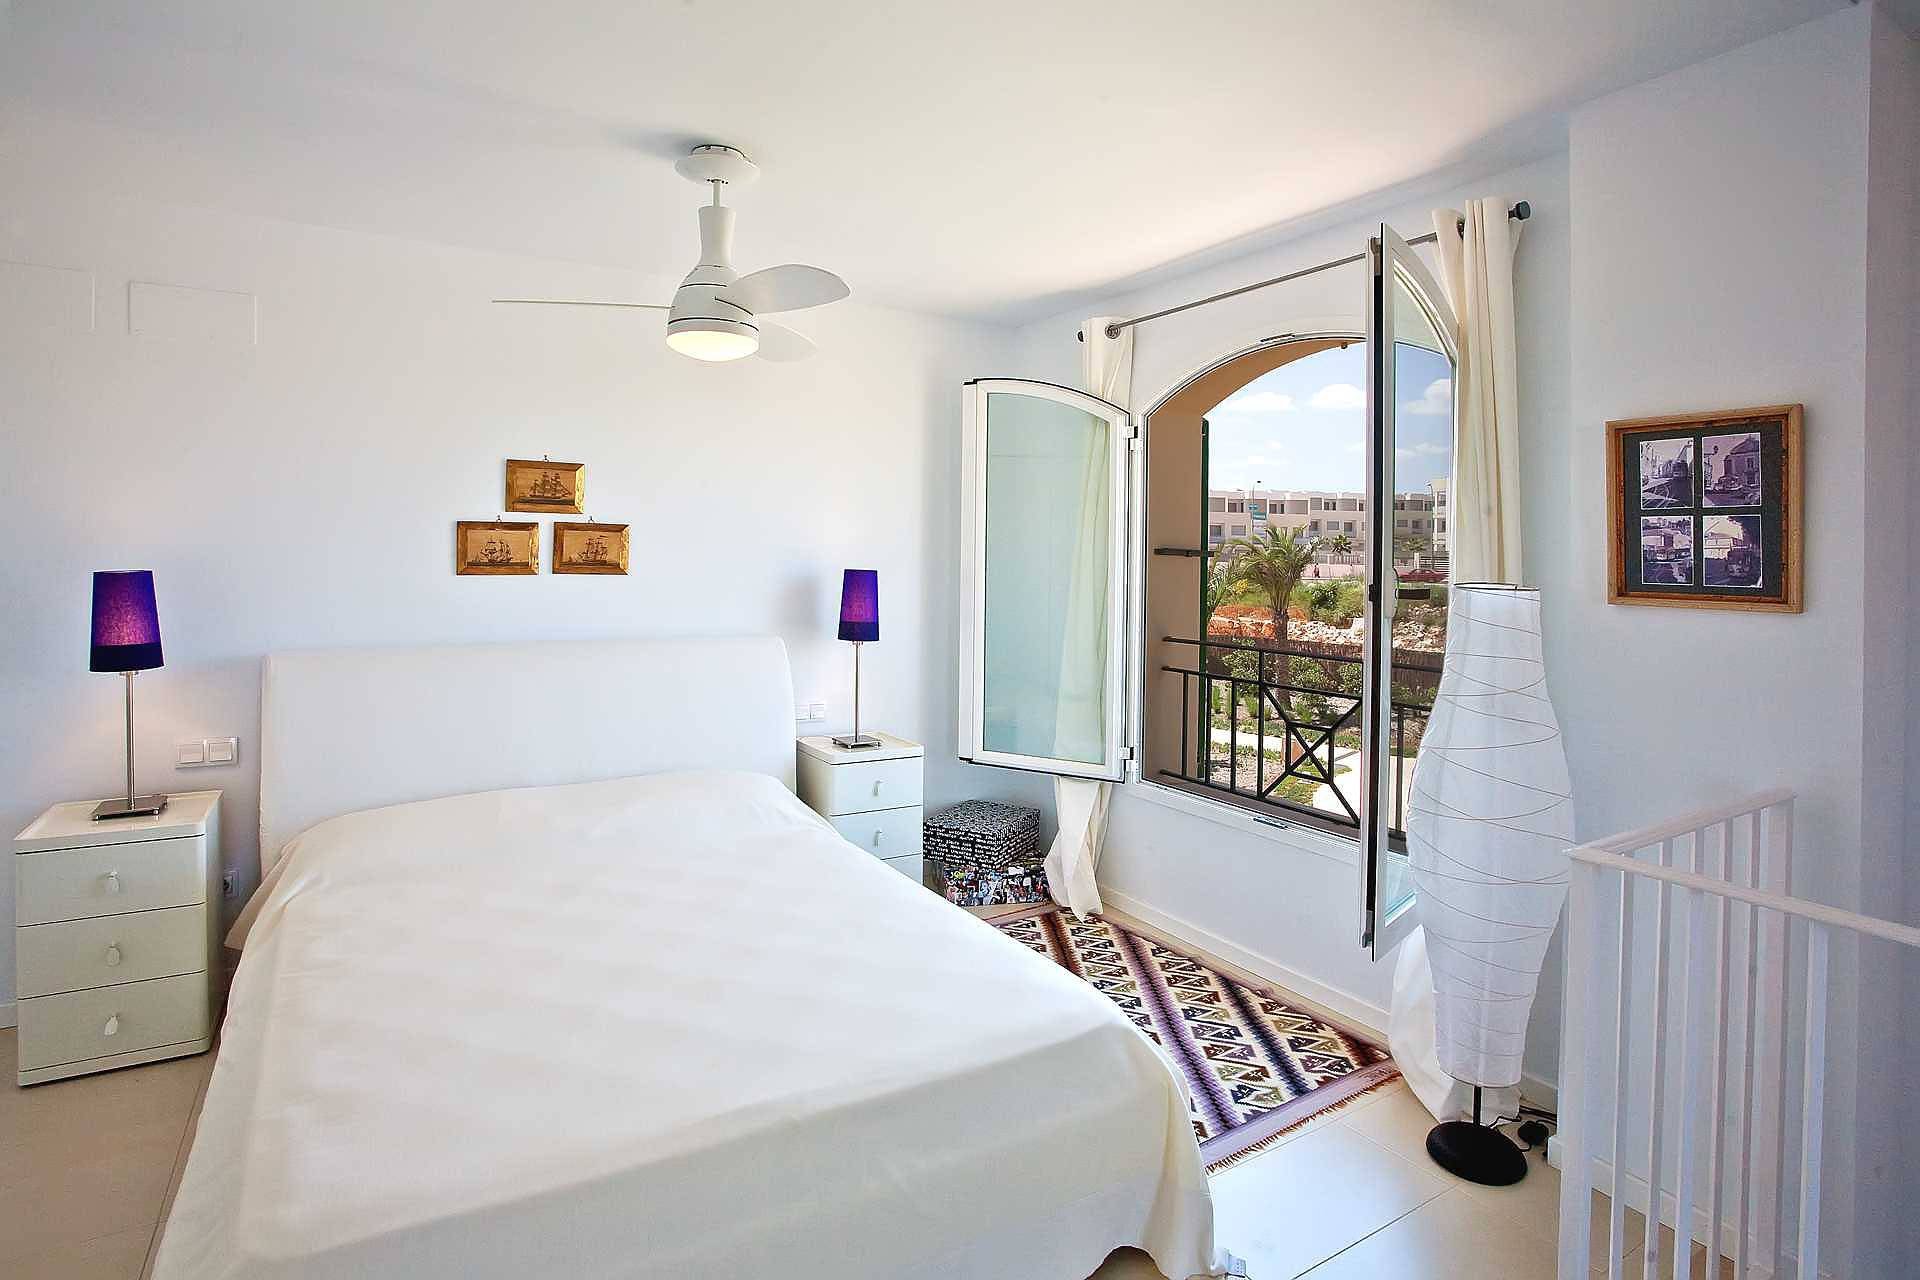 01-62 Modernes Ferienhaus Mallorca Osten Bild 18